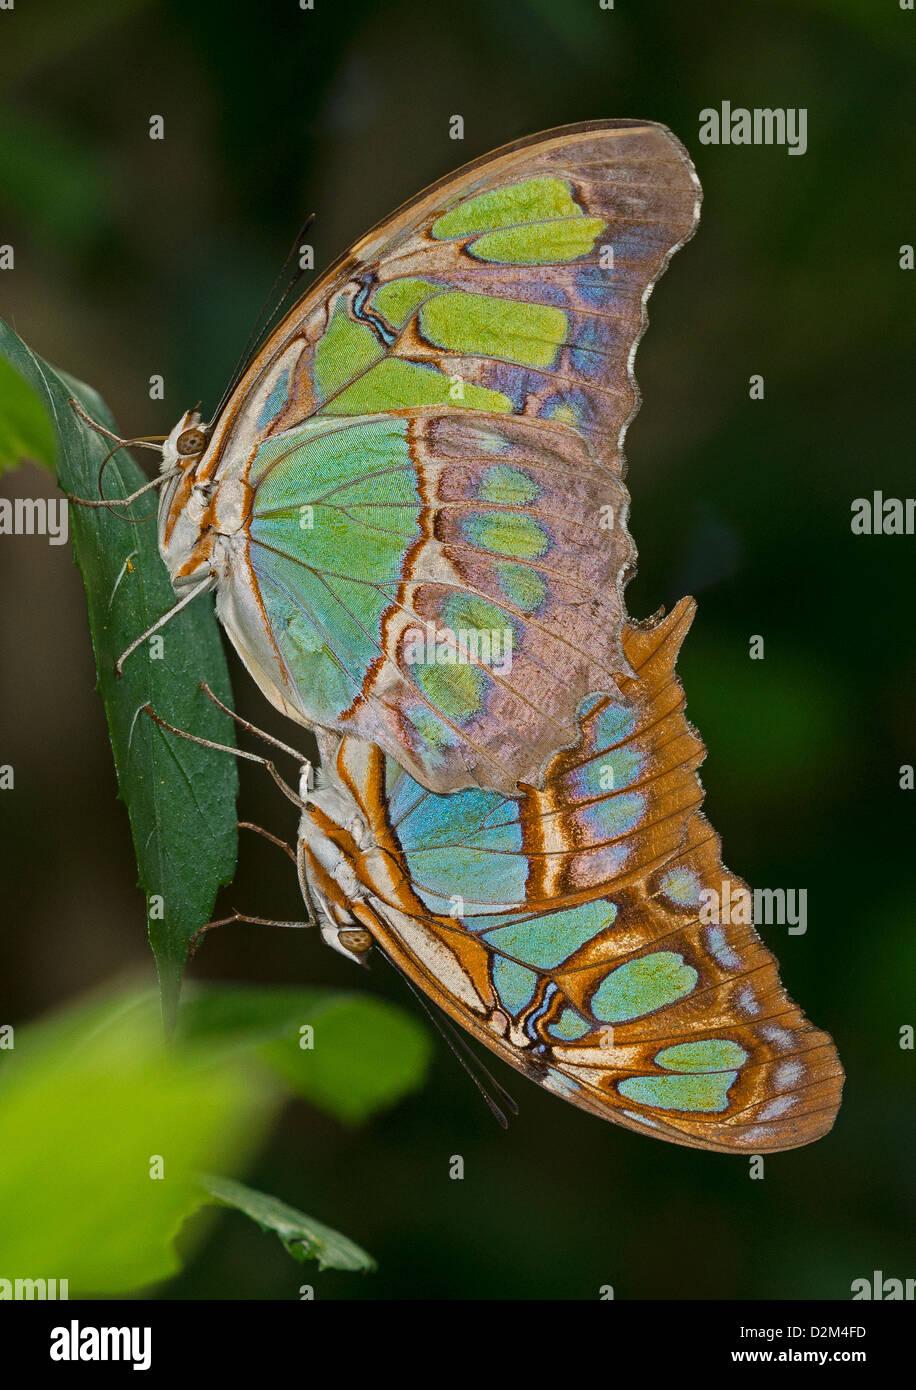 El apareamiento Malaquita mariposas Foto de stock